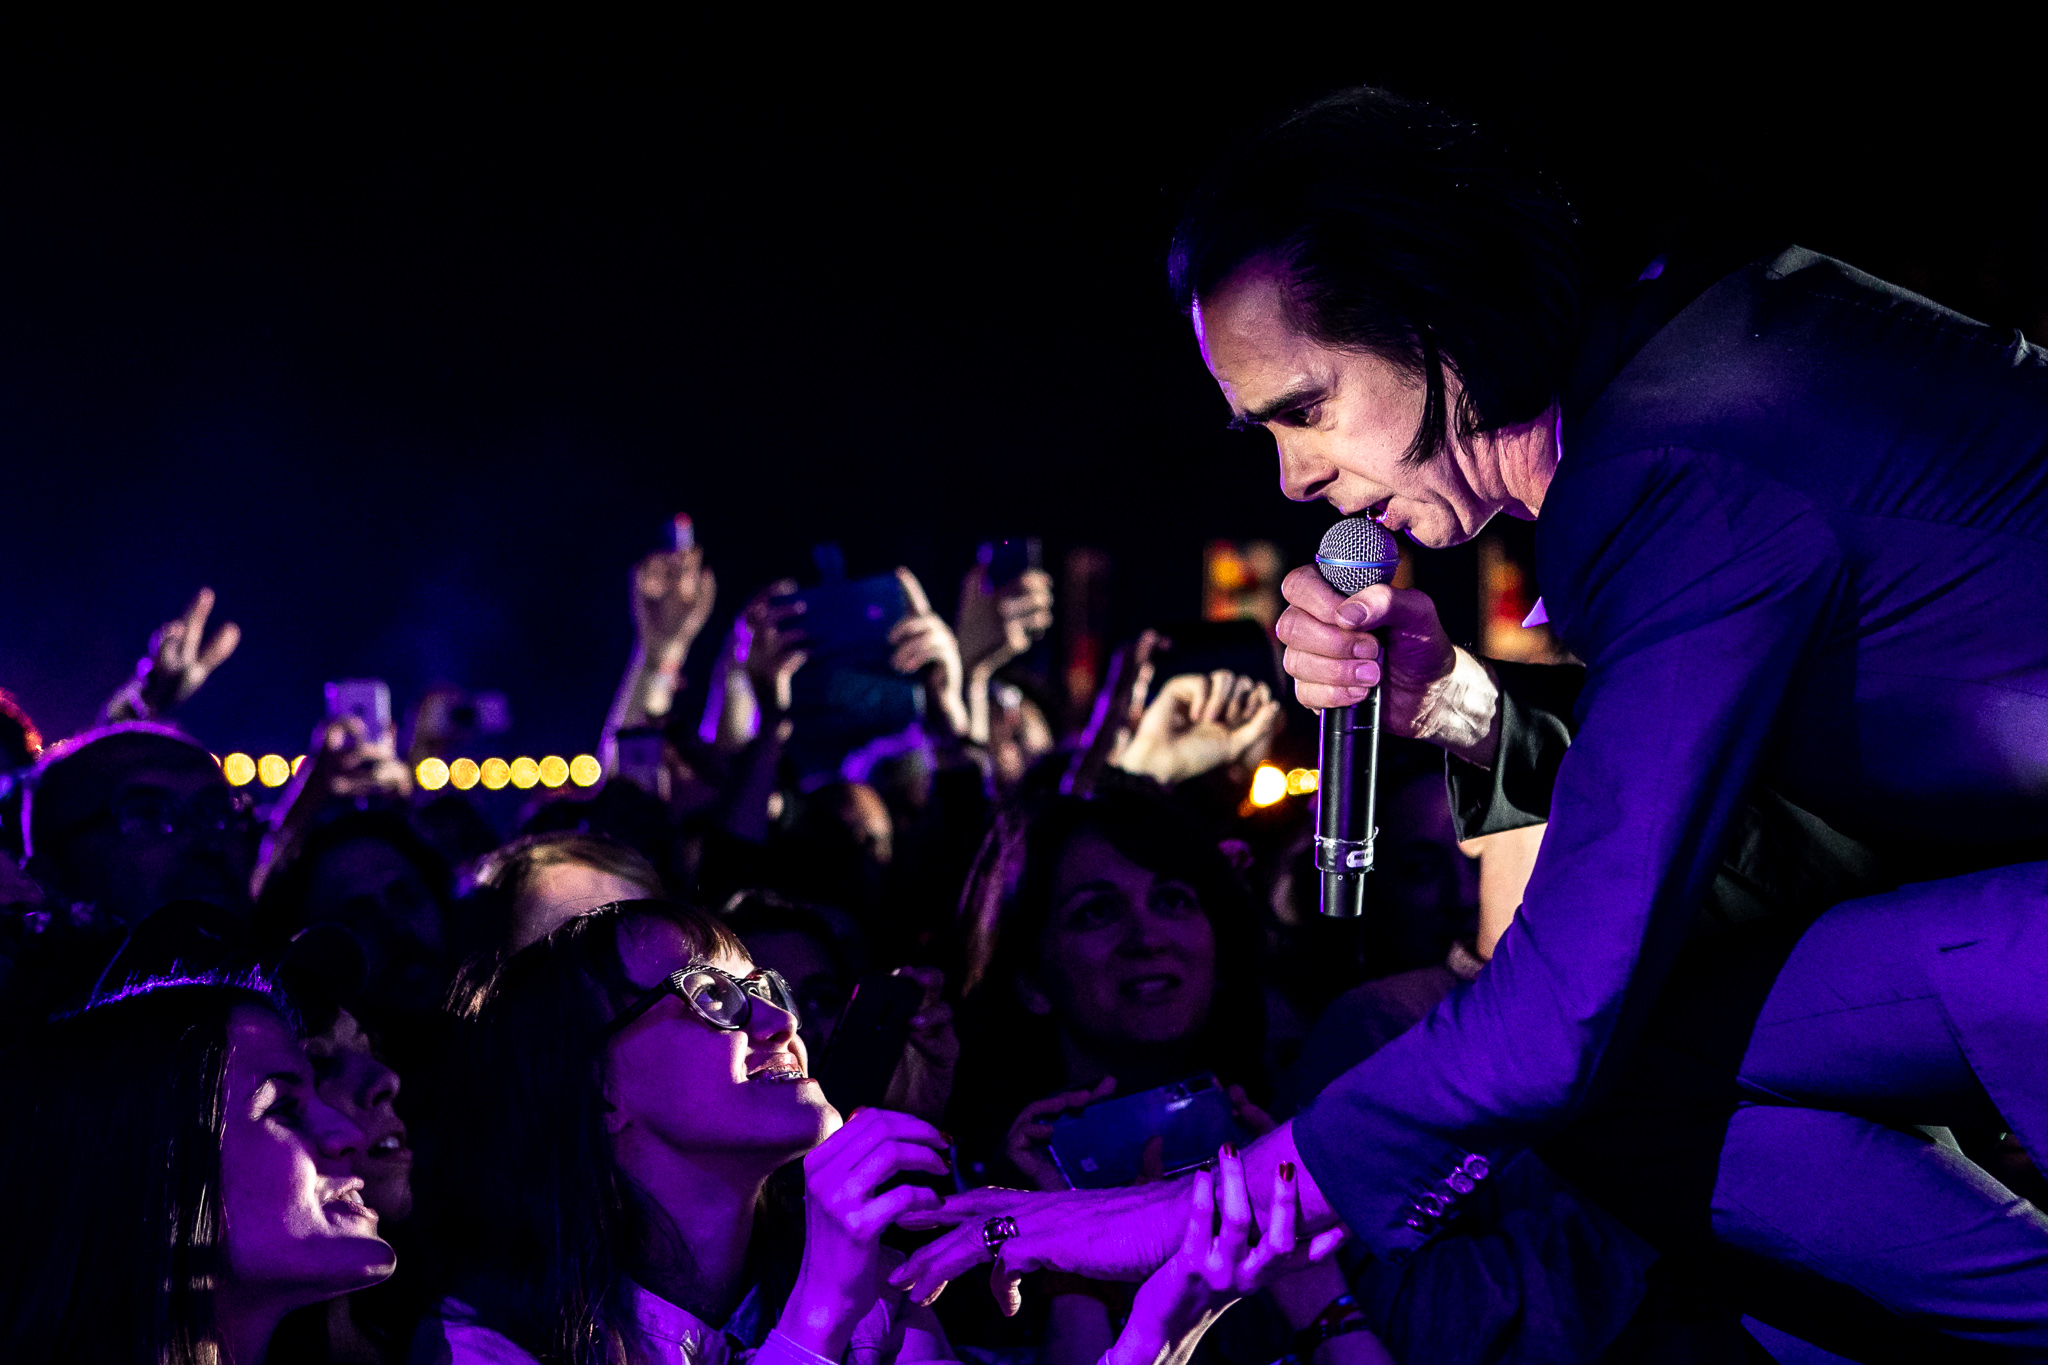 Nick Cave, InMusic, Deus Me Livro